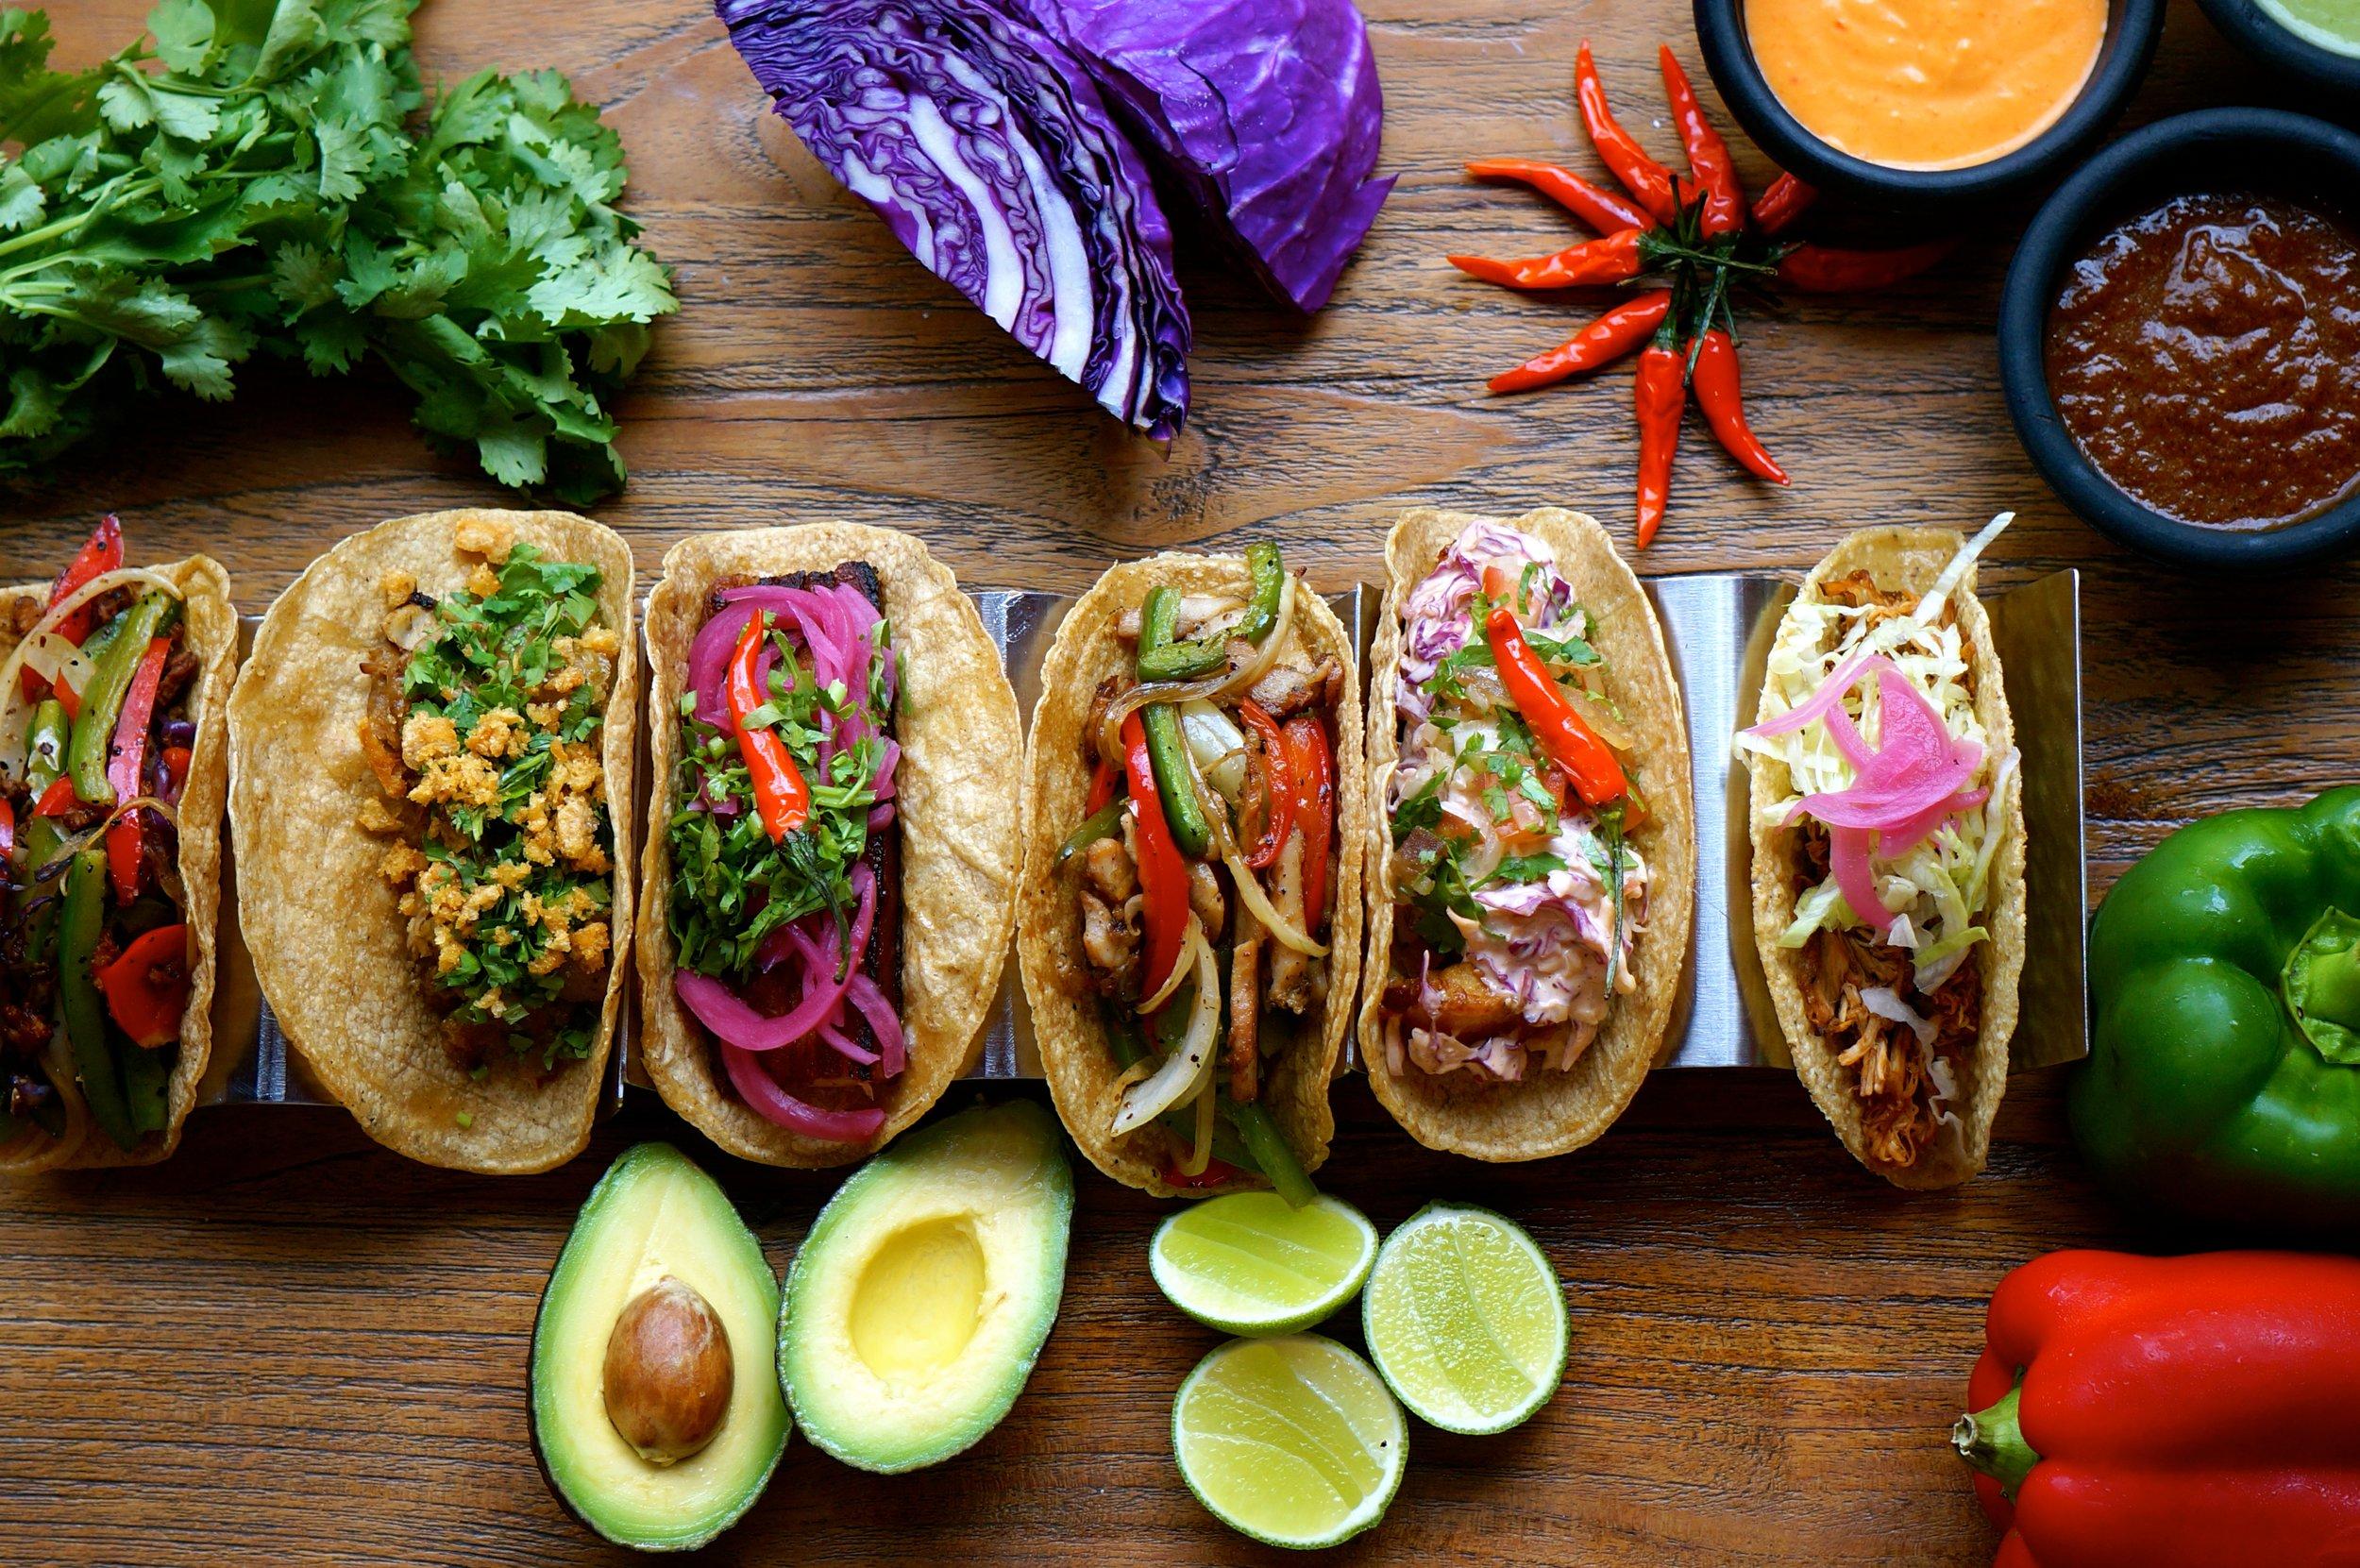 CQ_Senor-Taco_Tacos.JPG